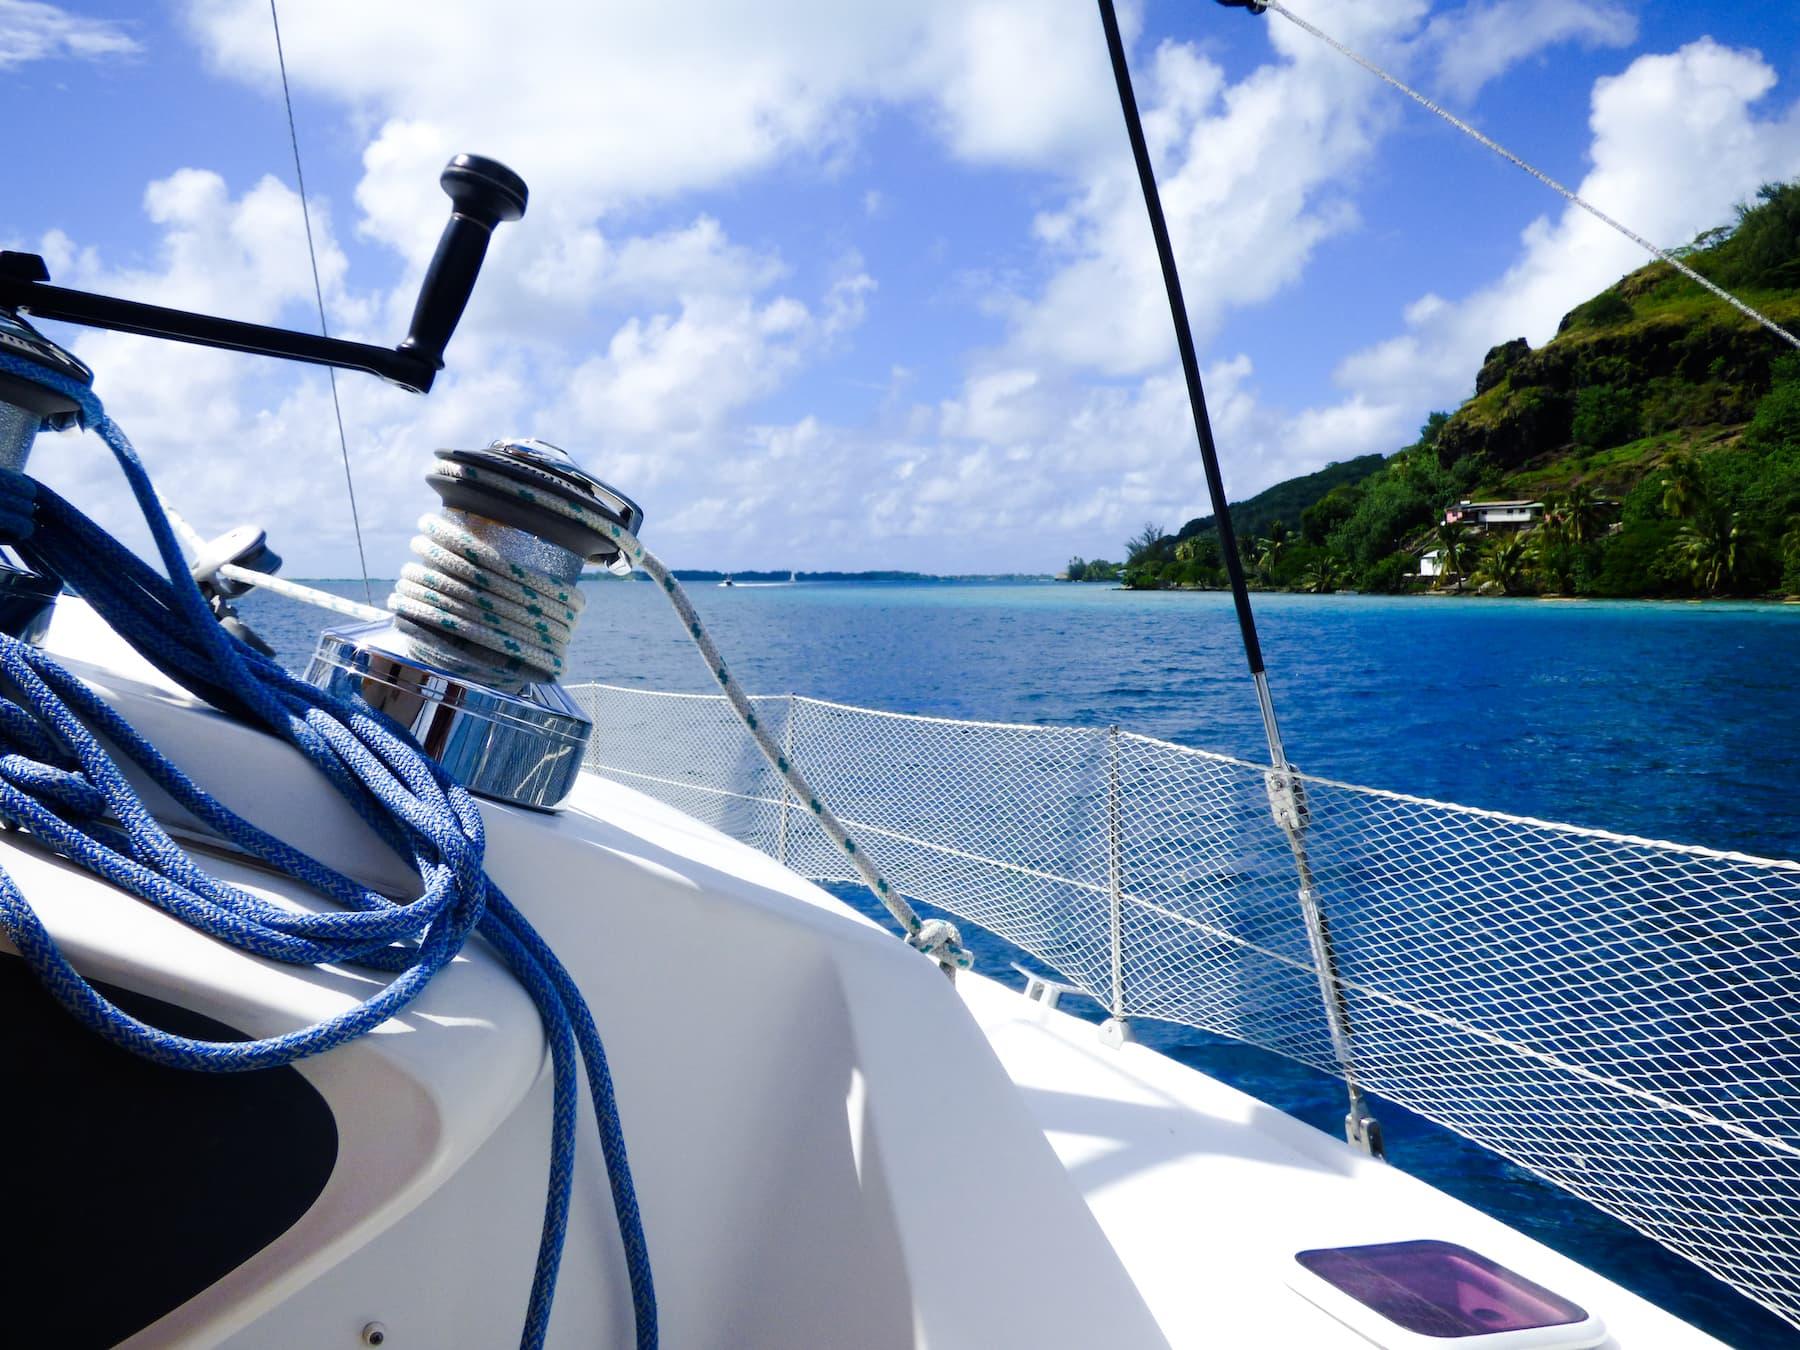 https://tahititourisme.cn/wp-content/uploads/2017/08/bateau-tlc-modif-13.jpg